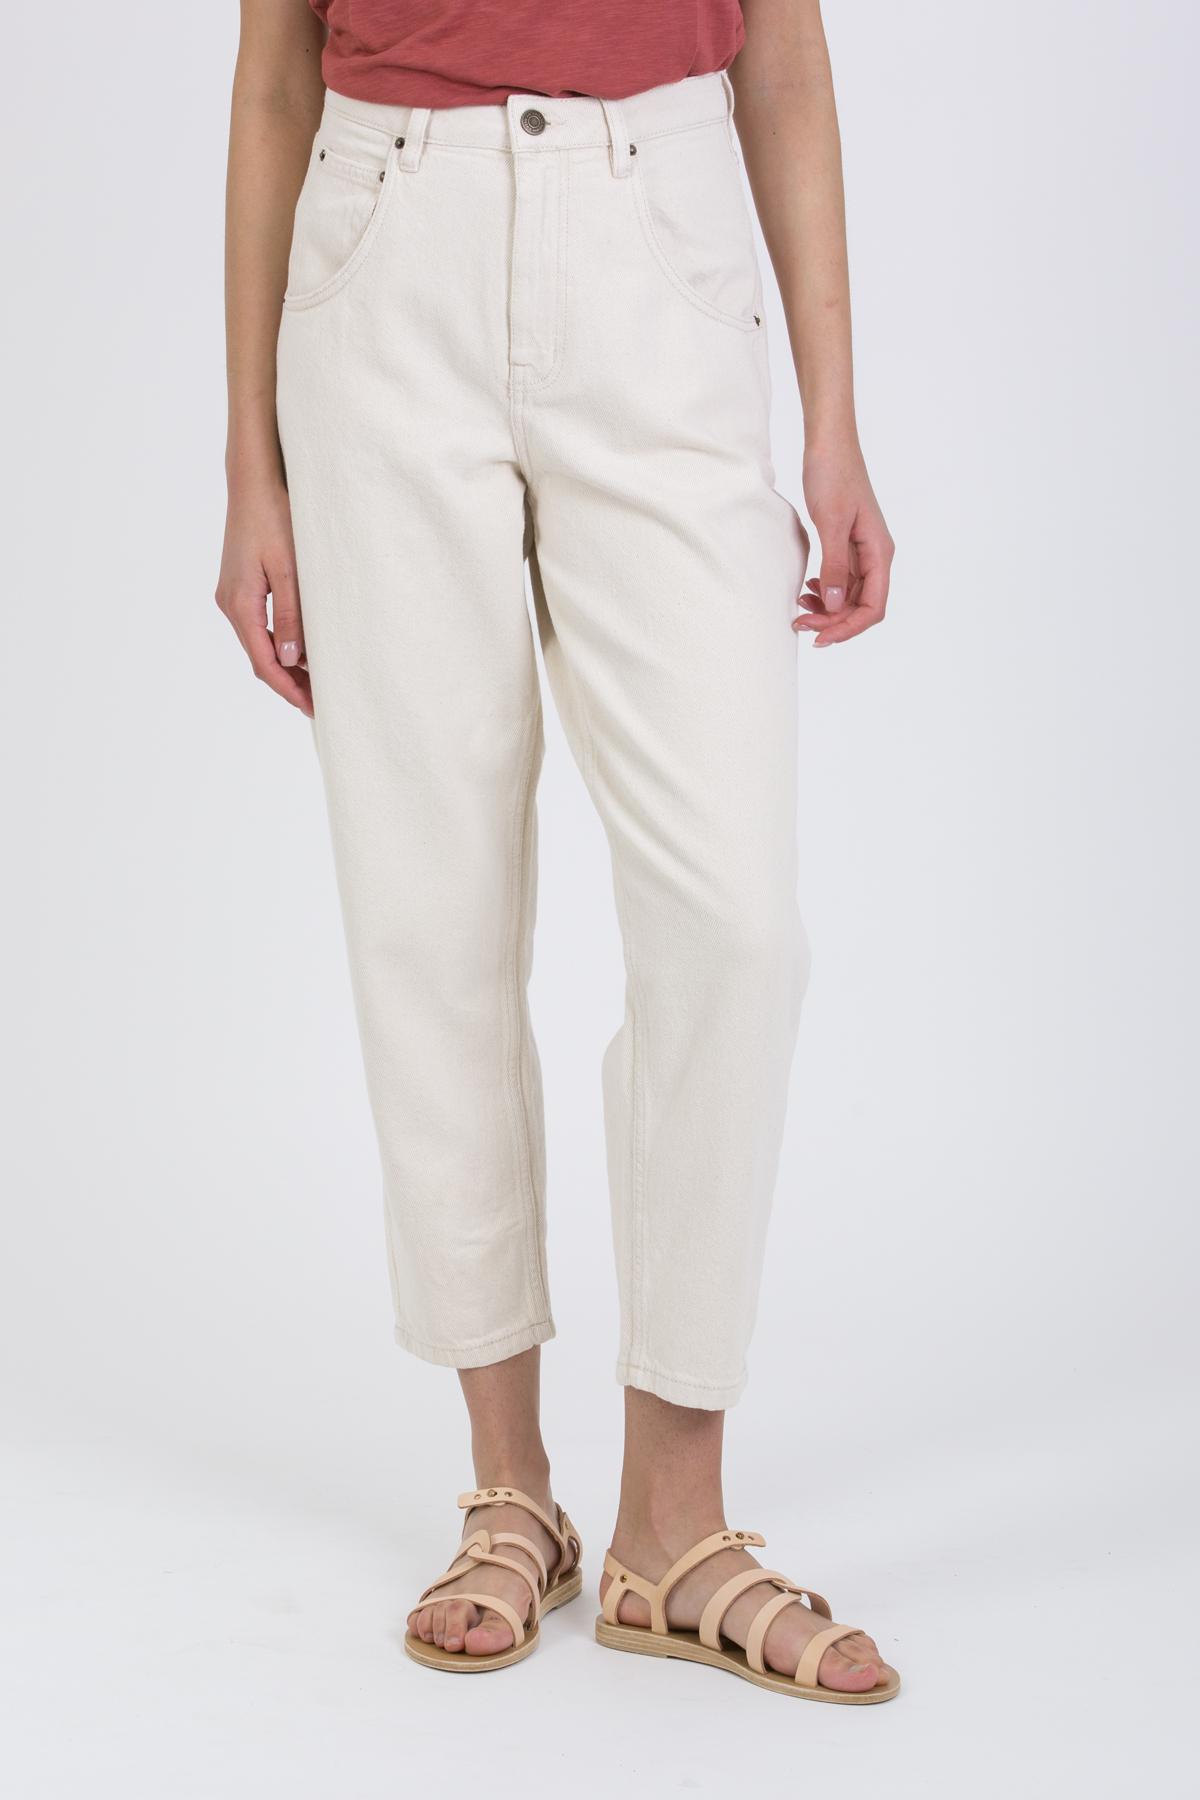 tine-borow-TINE11AE21-jeans-ecru-american-vintage-matchboxa